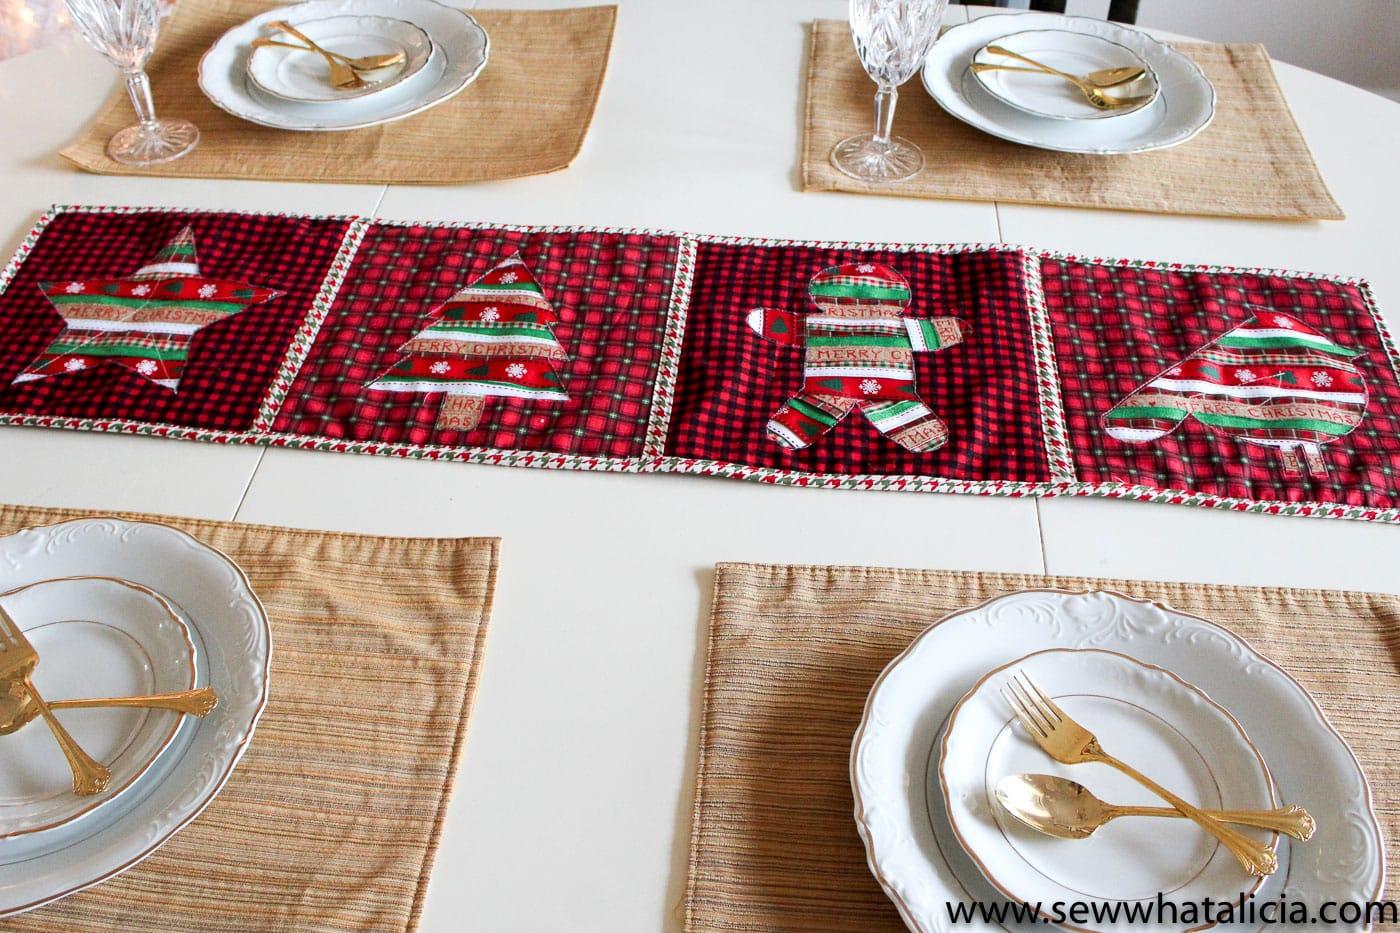 Reverse Applique Christmas Table Runner Tutorial The Polka Dot Chair